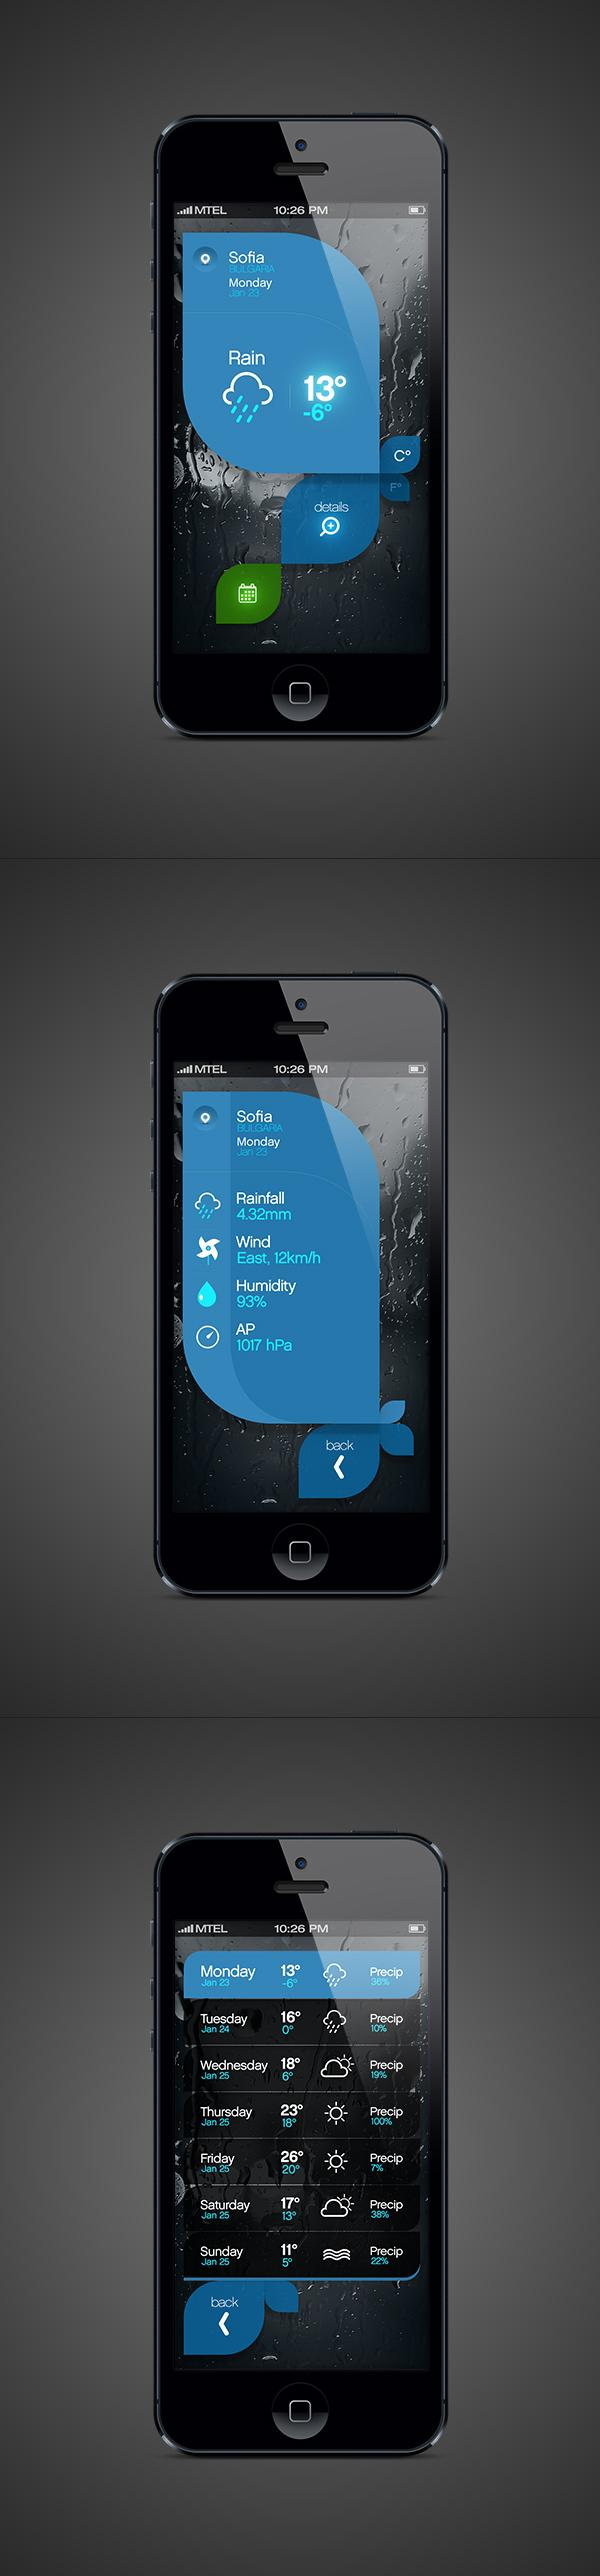 Weather App on